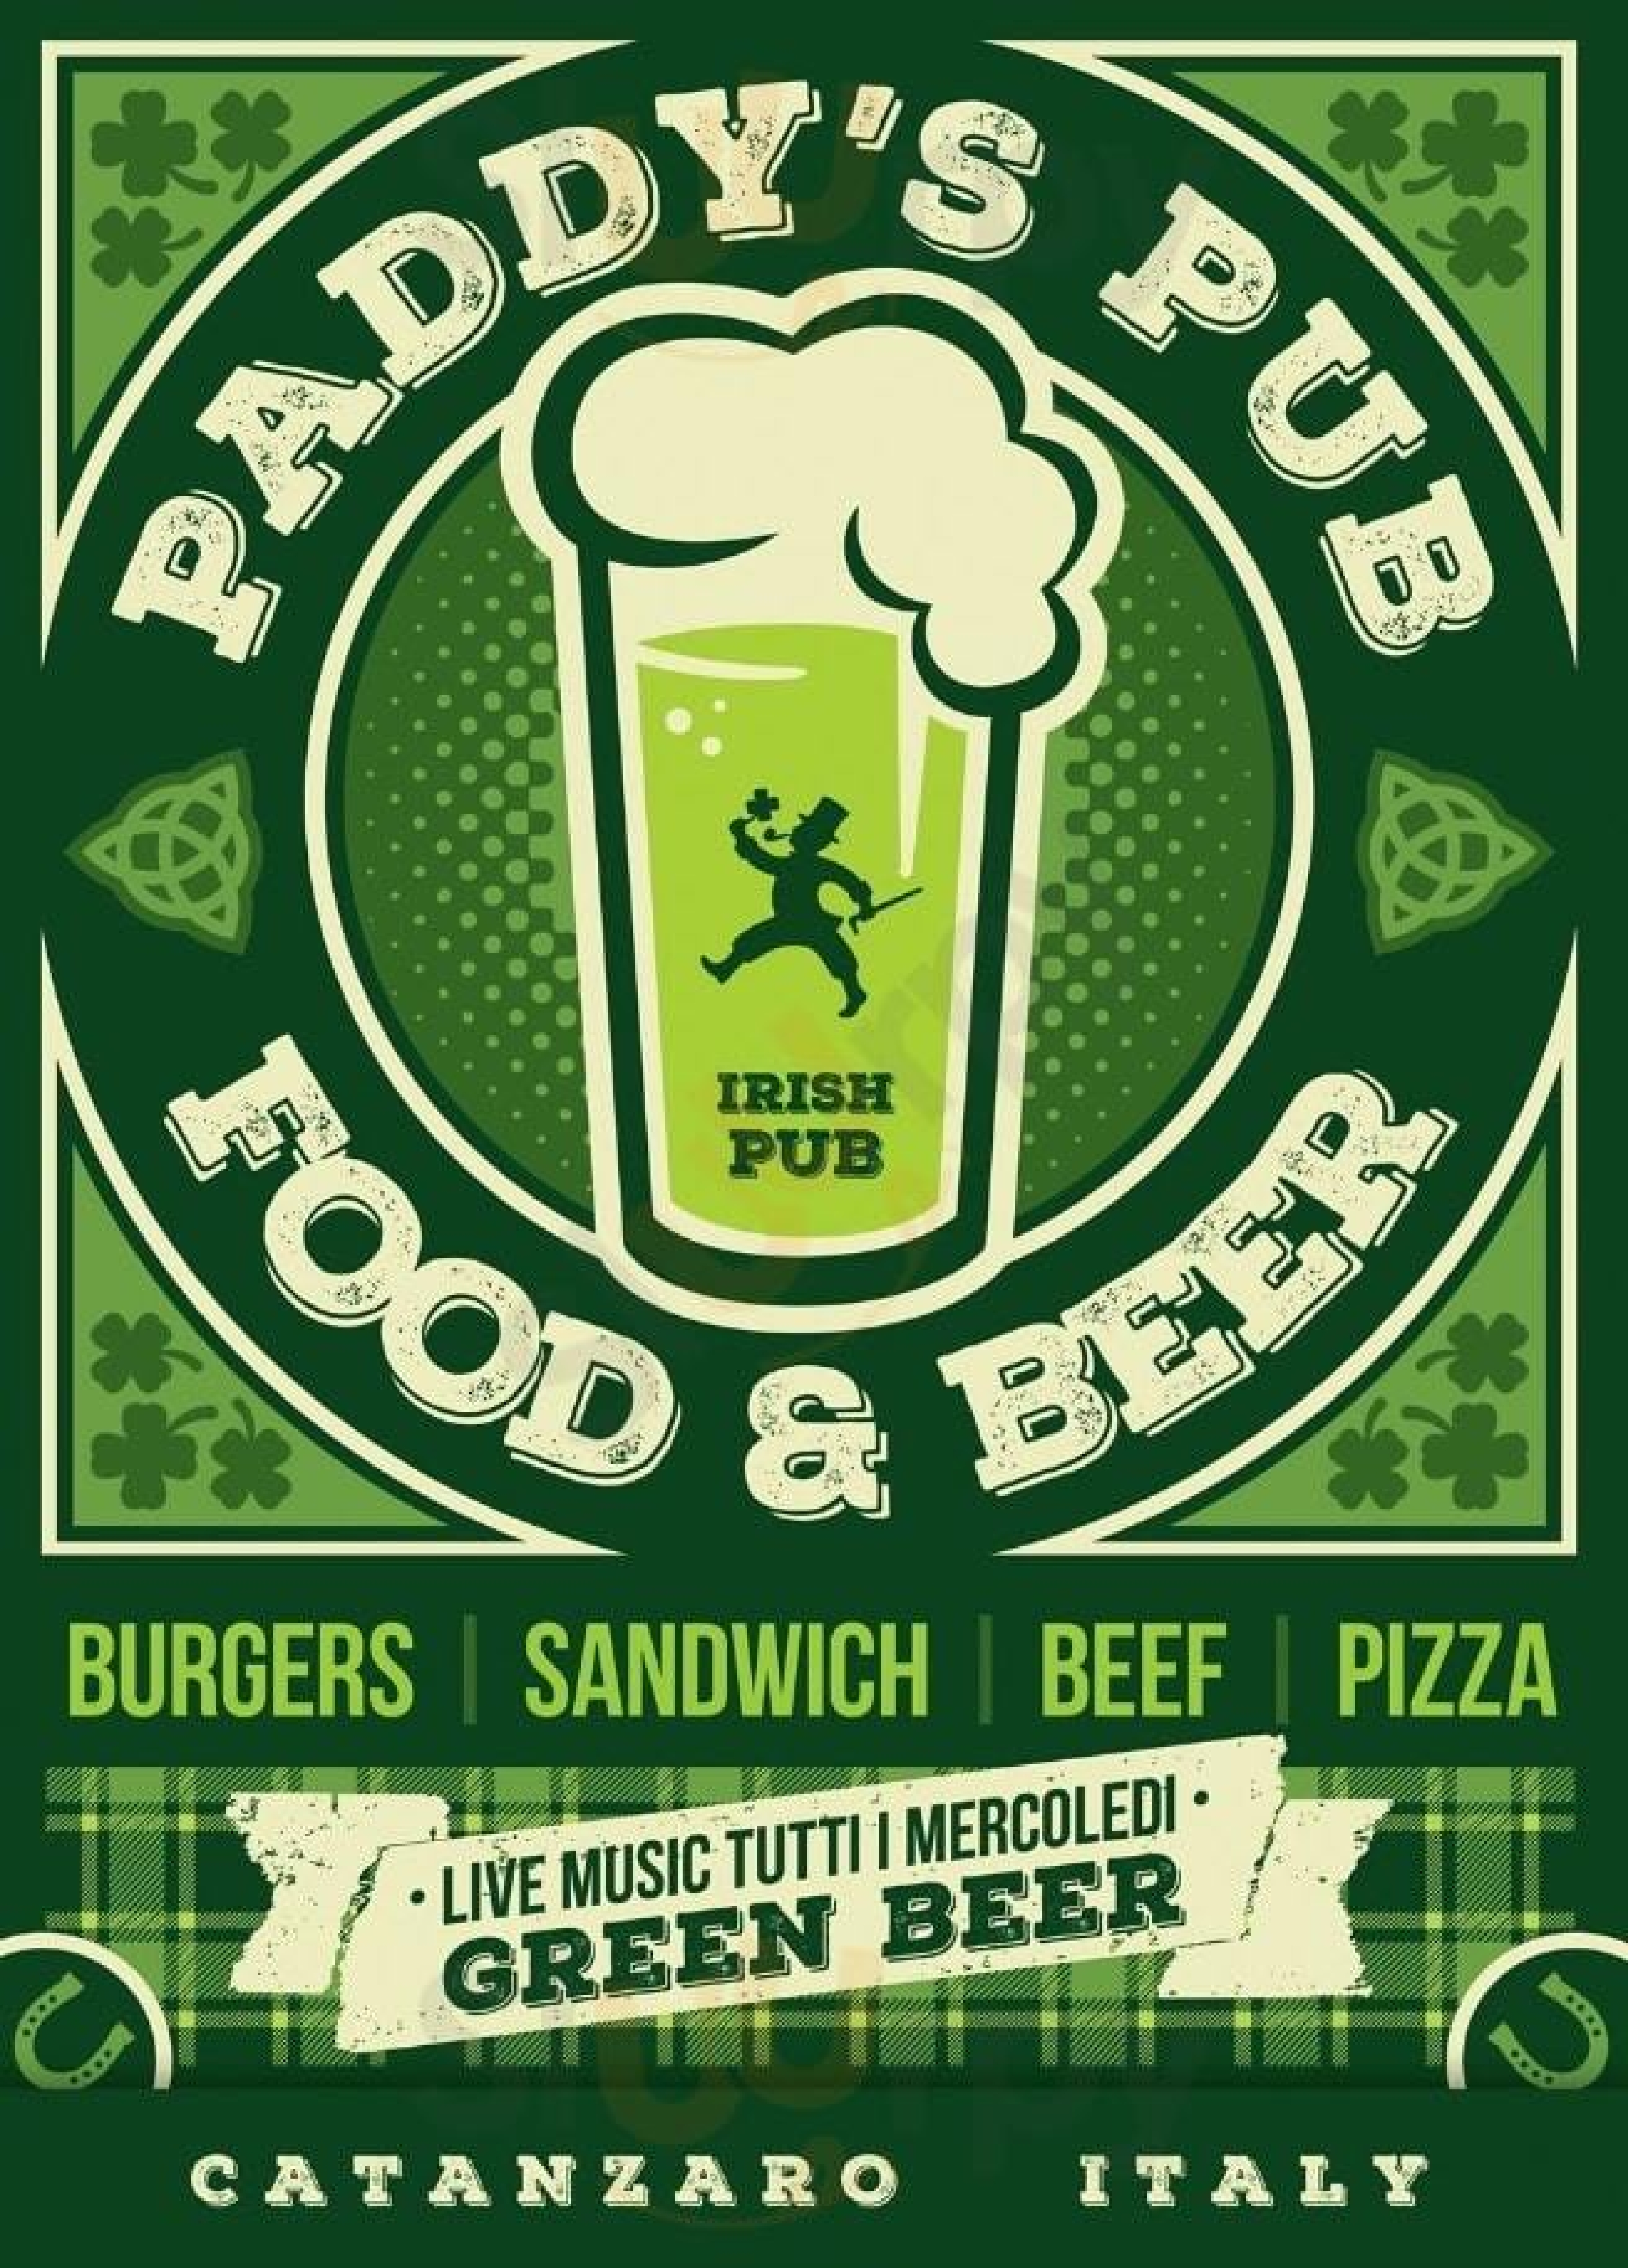 Paddy's Irish Pub Catanzaro menù 1 pagina